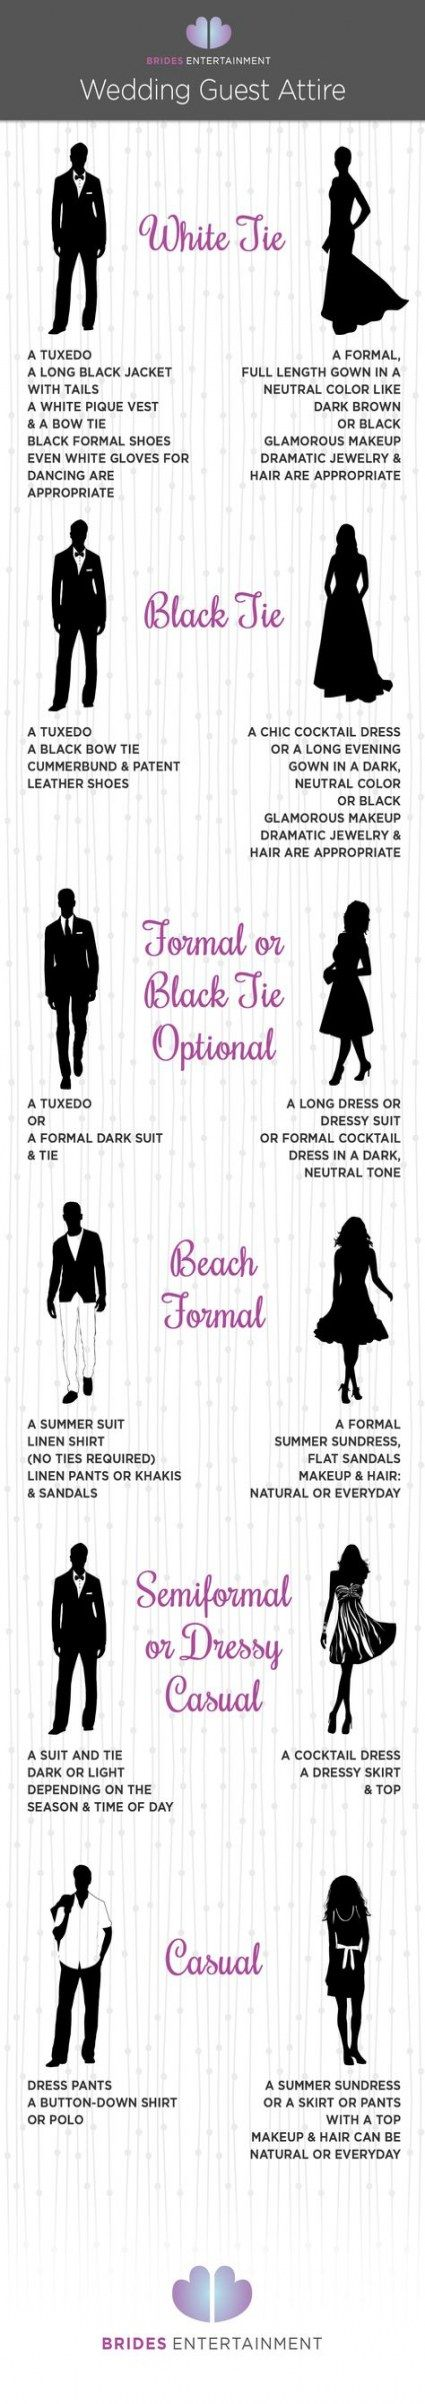 Wedding Guest Etiquette Dress Codes What To Wear 21 Best Ideas Wedding Party Dress Guest Wedding Attire Guest Wedding Guest Style [ 2404 x 425 Pixel ]